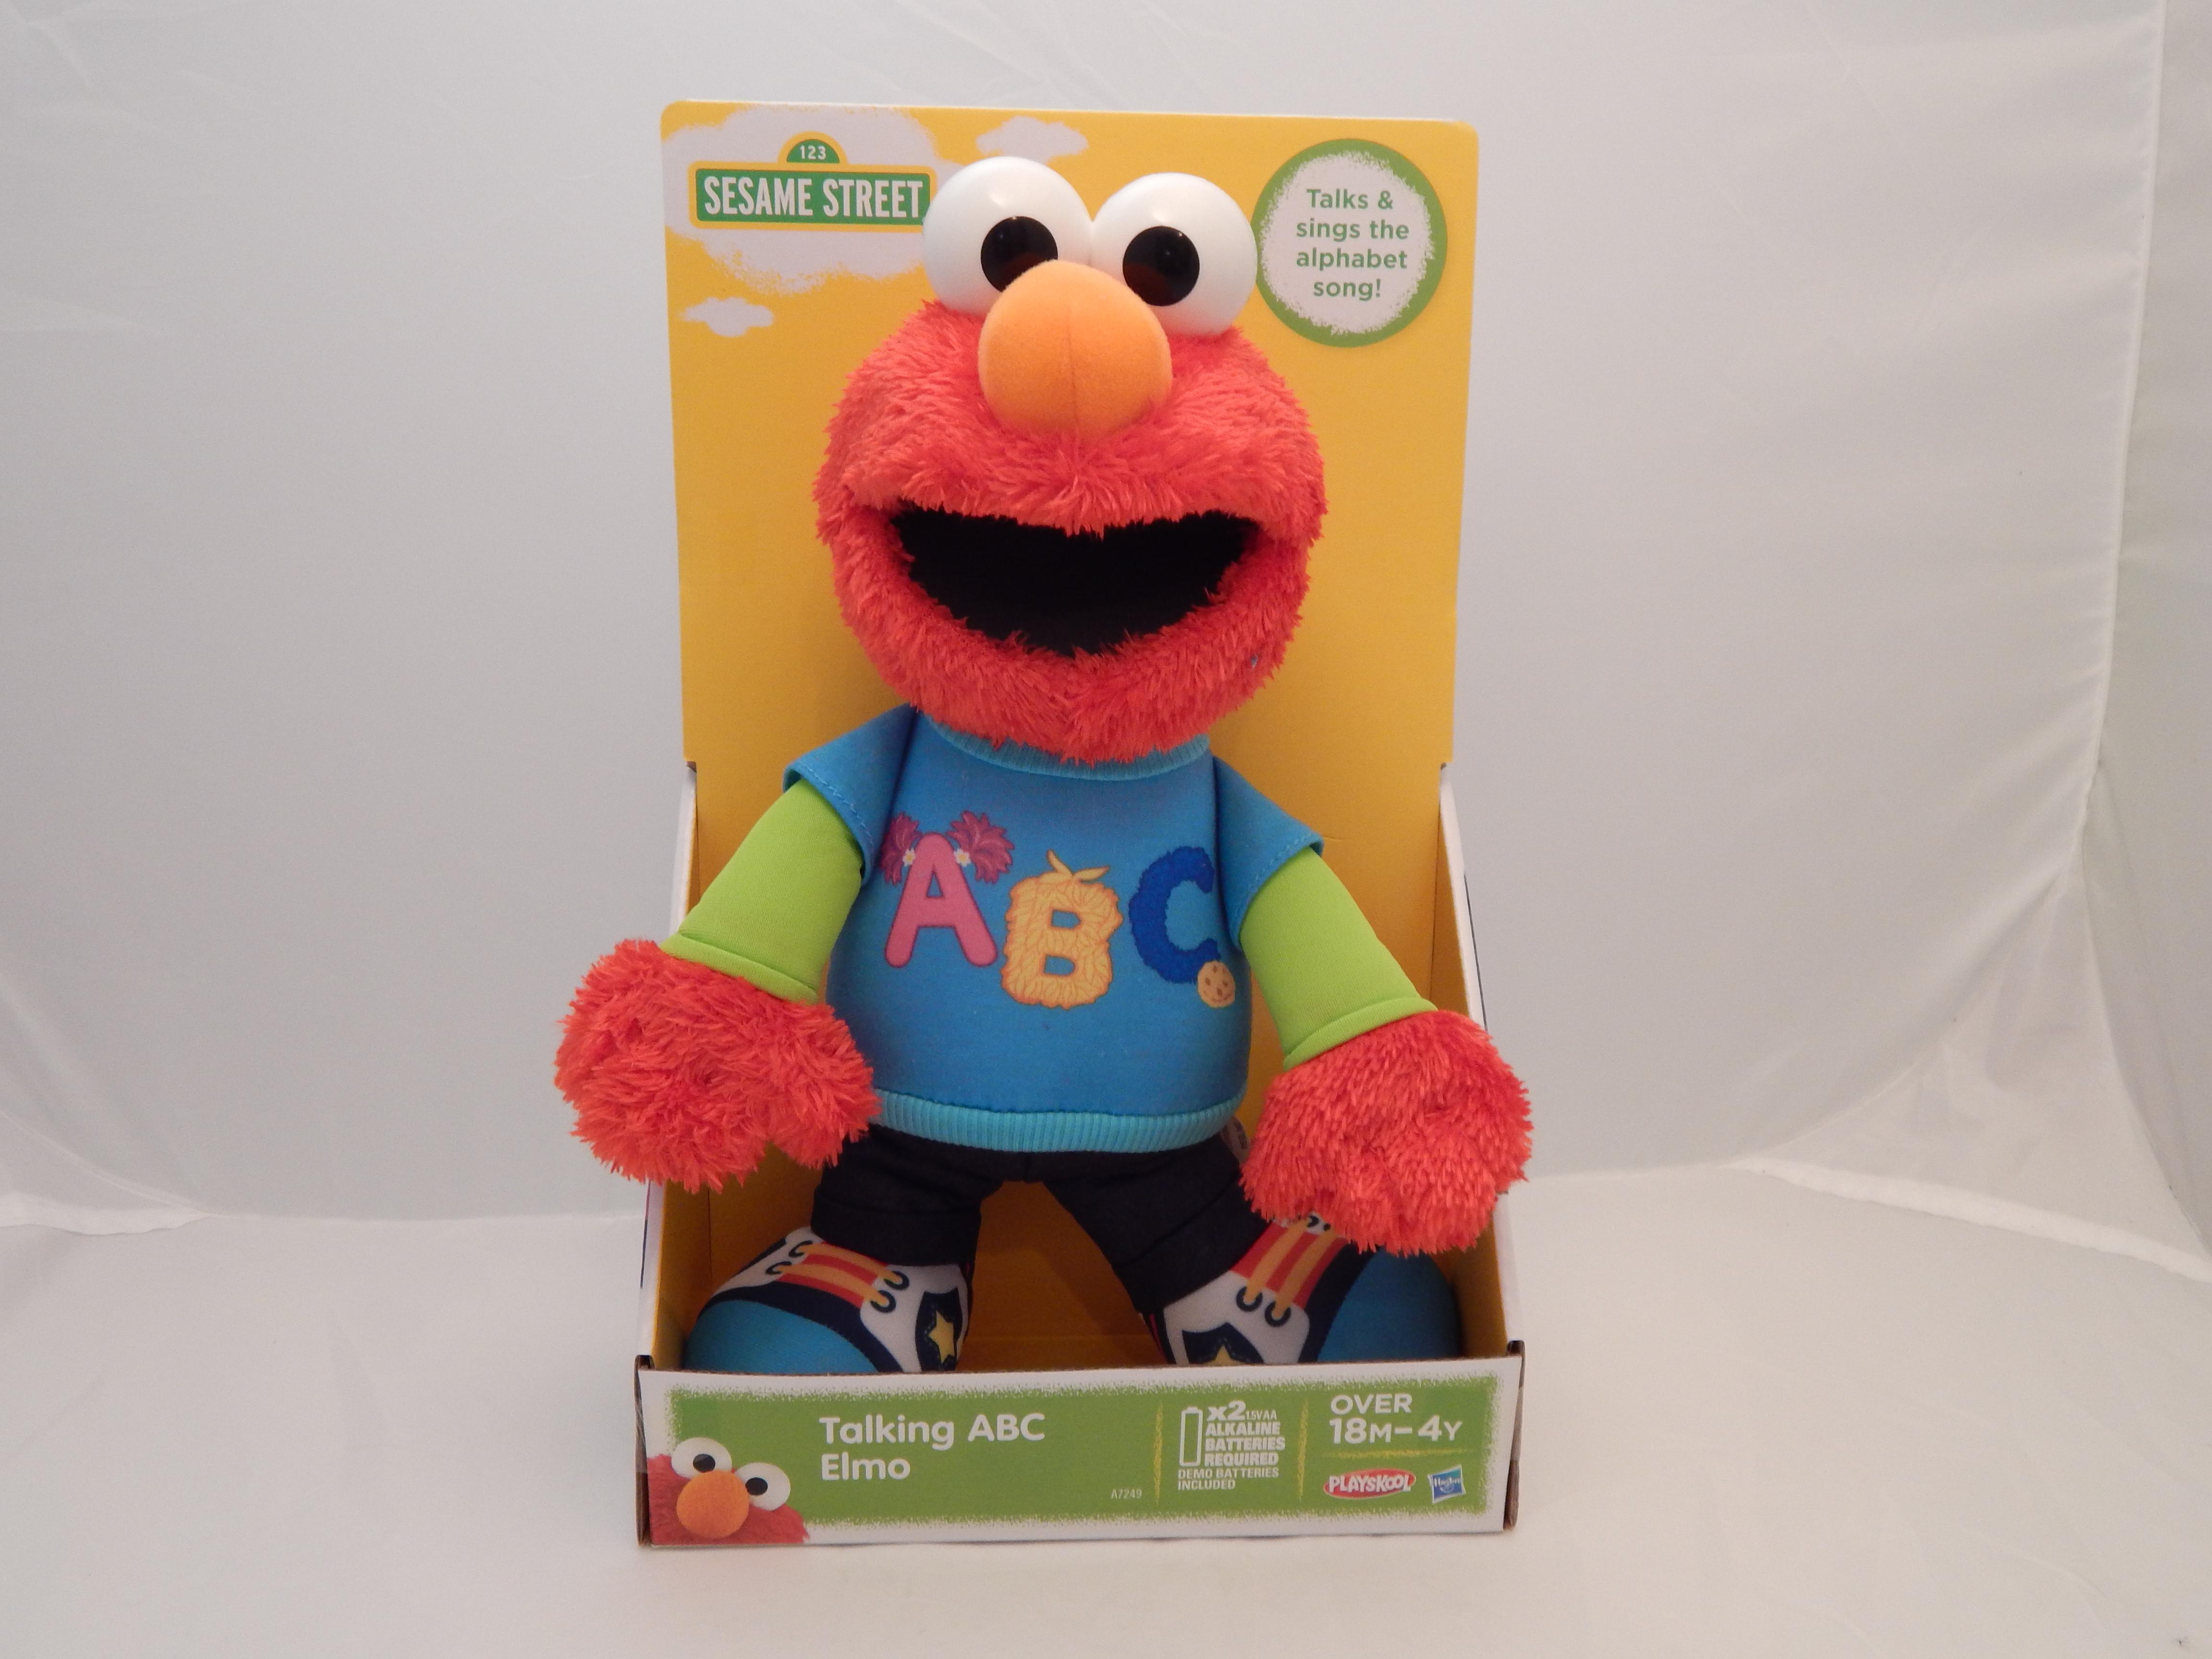 Sesame street plush doll news 2014 for Elmo abc